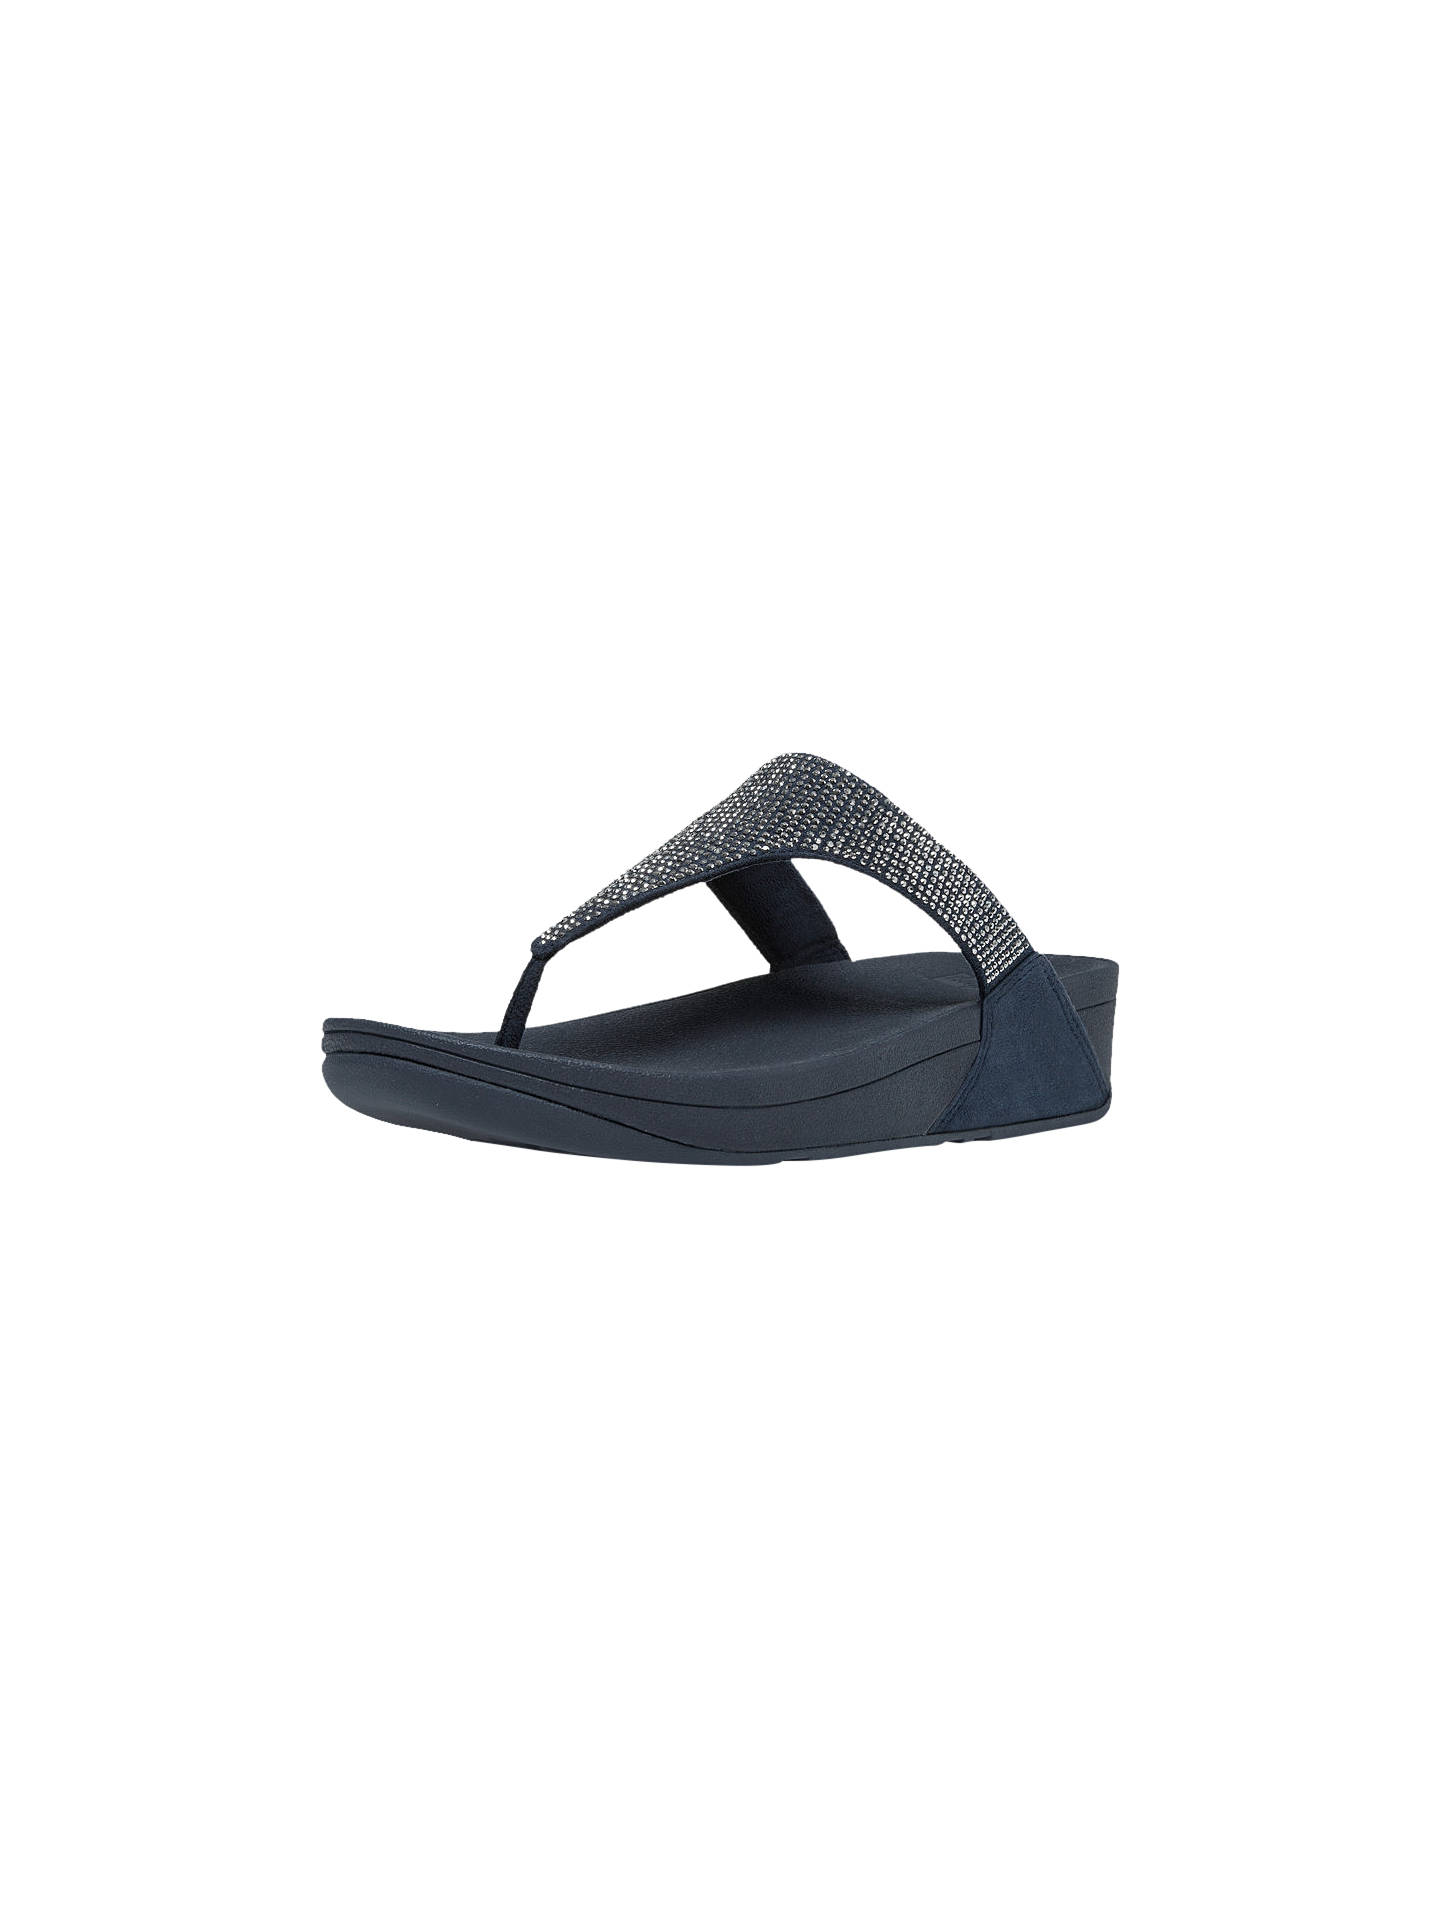 054d16c95 Buy FitFlop Slinky Rokkit Toe Post Sandals